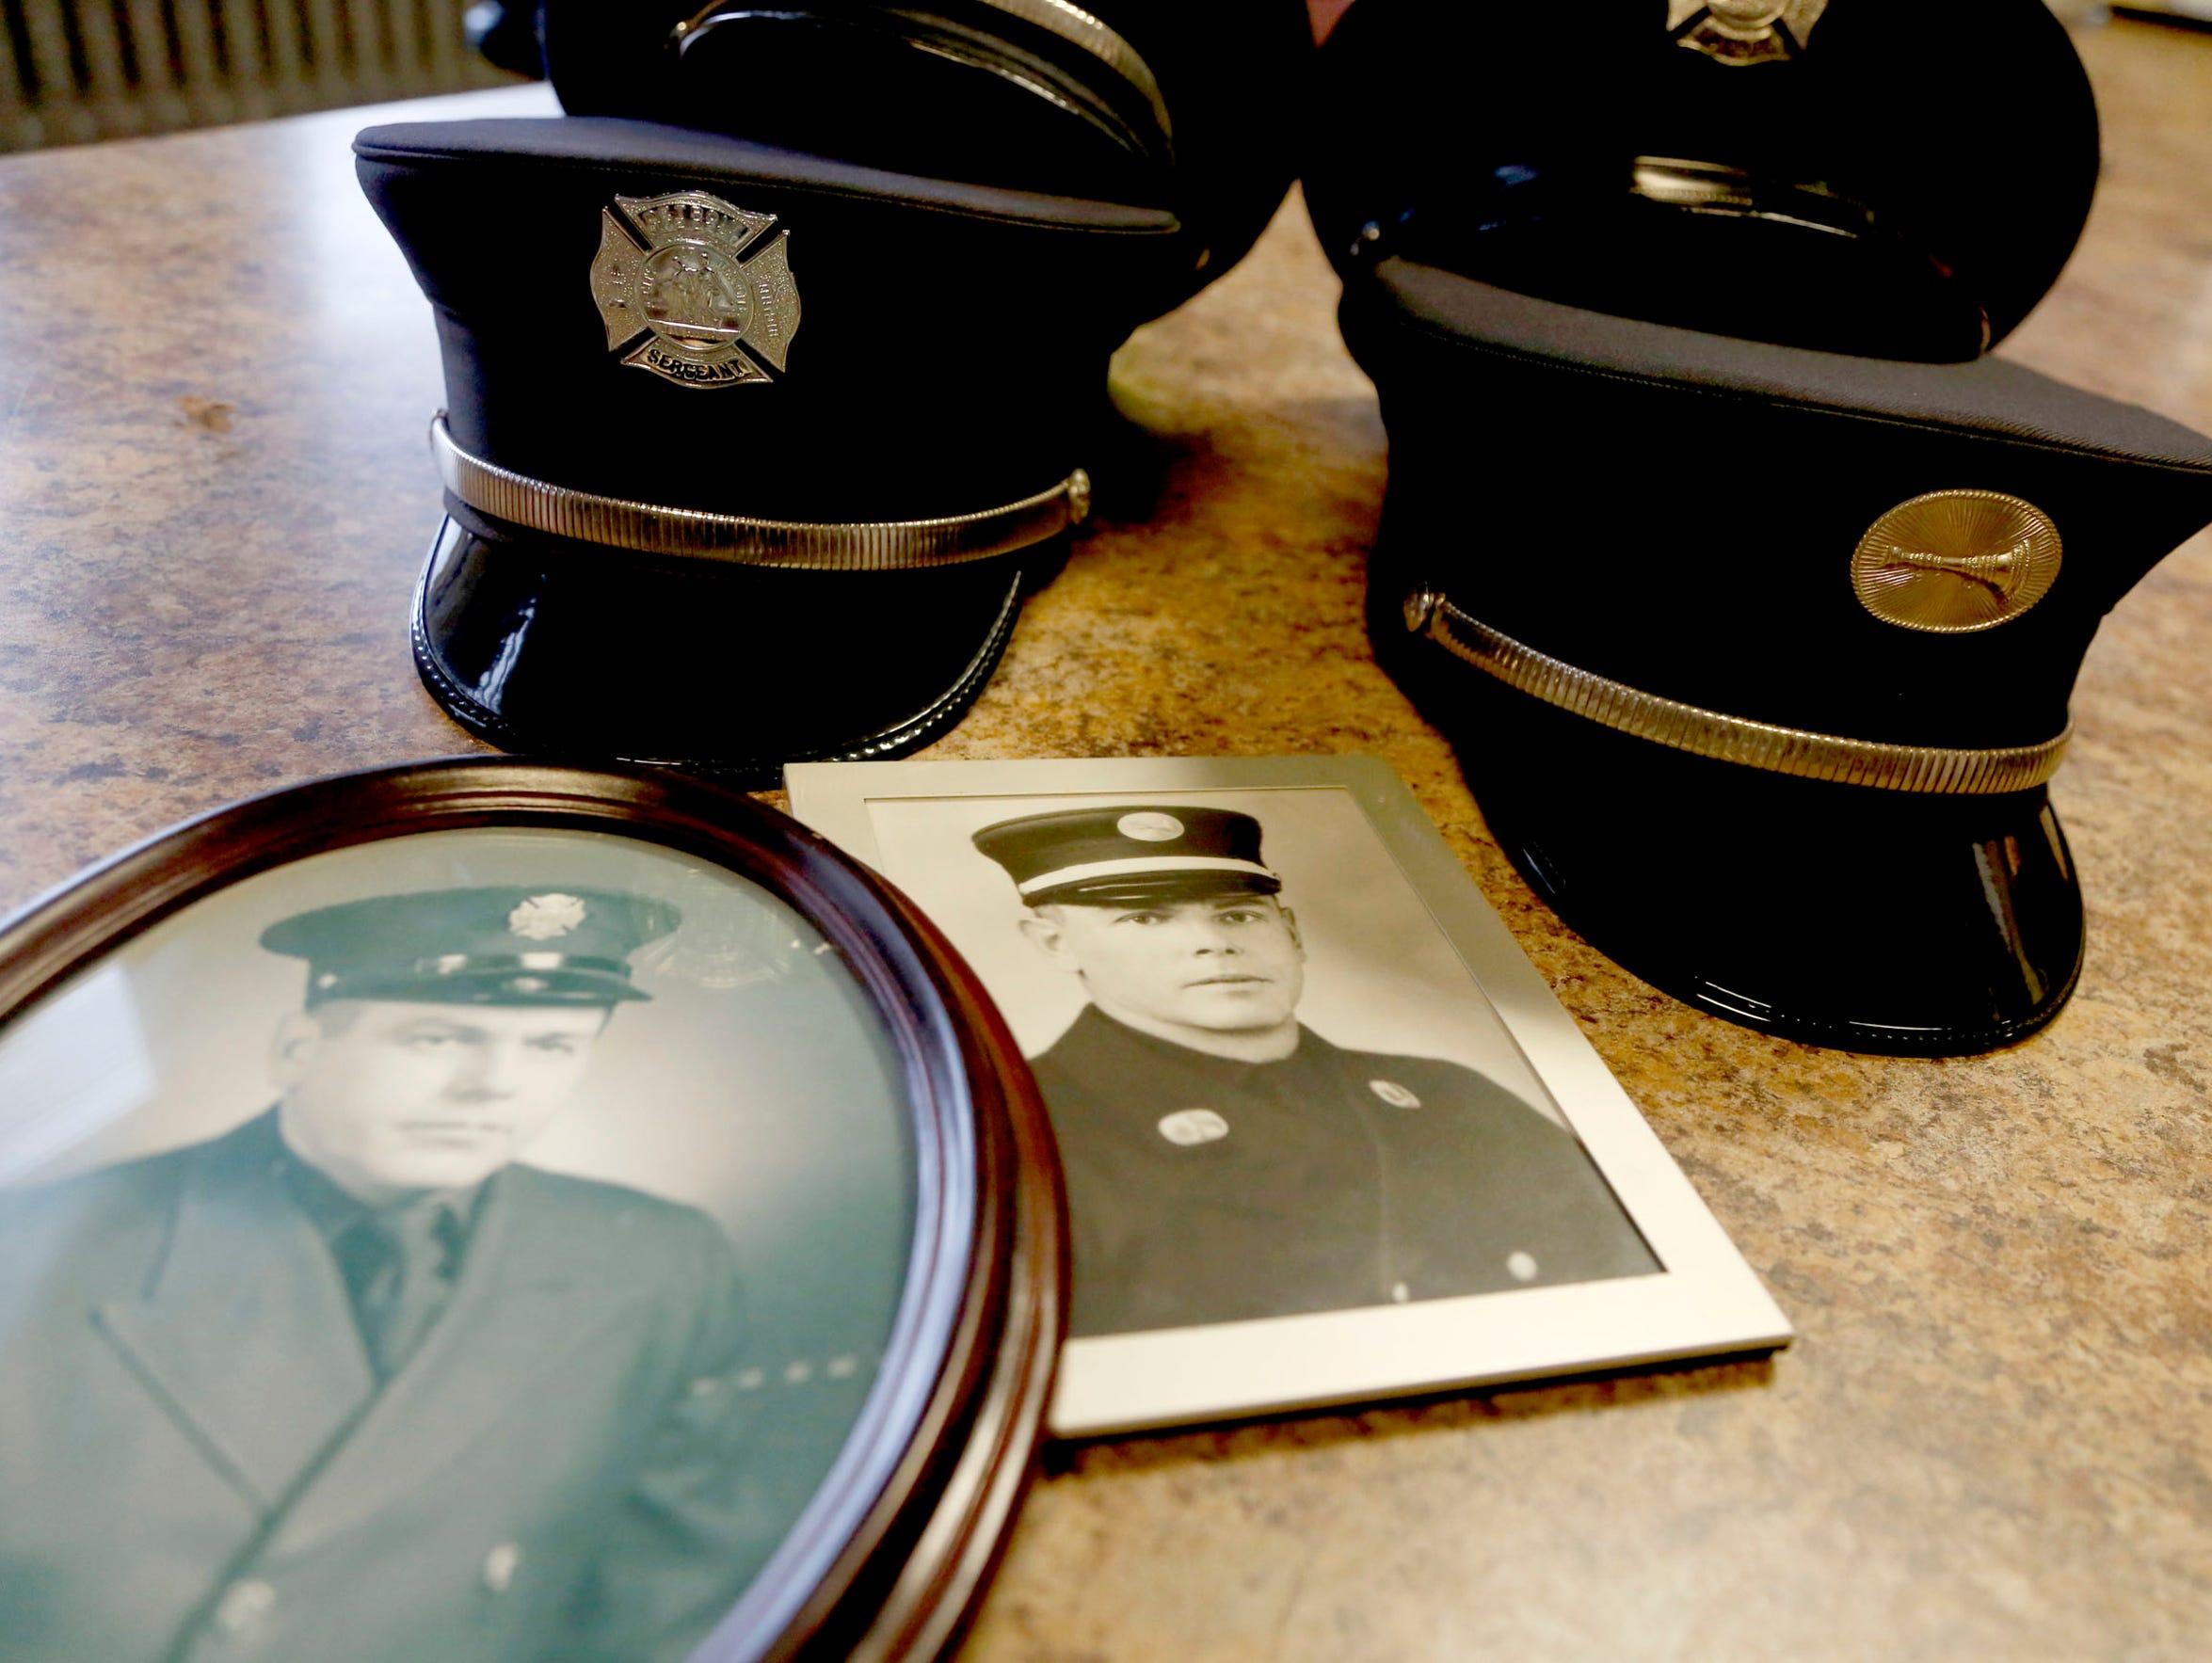 Detroit Fire Department firefighters Lt. John E. Doll